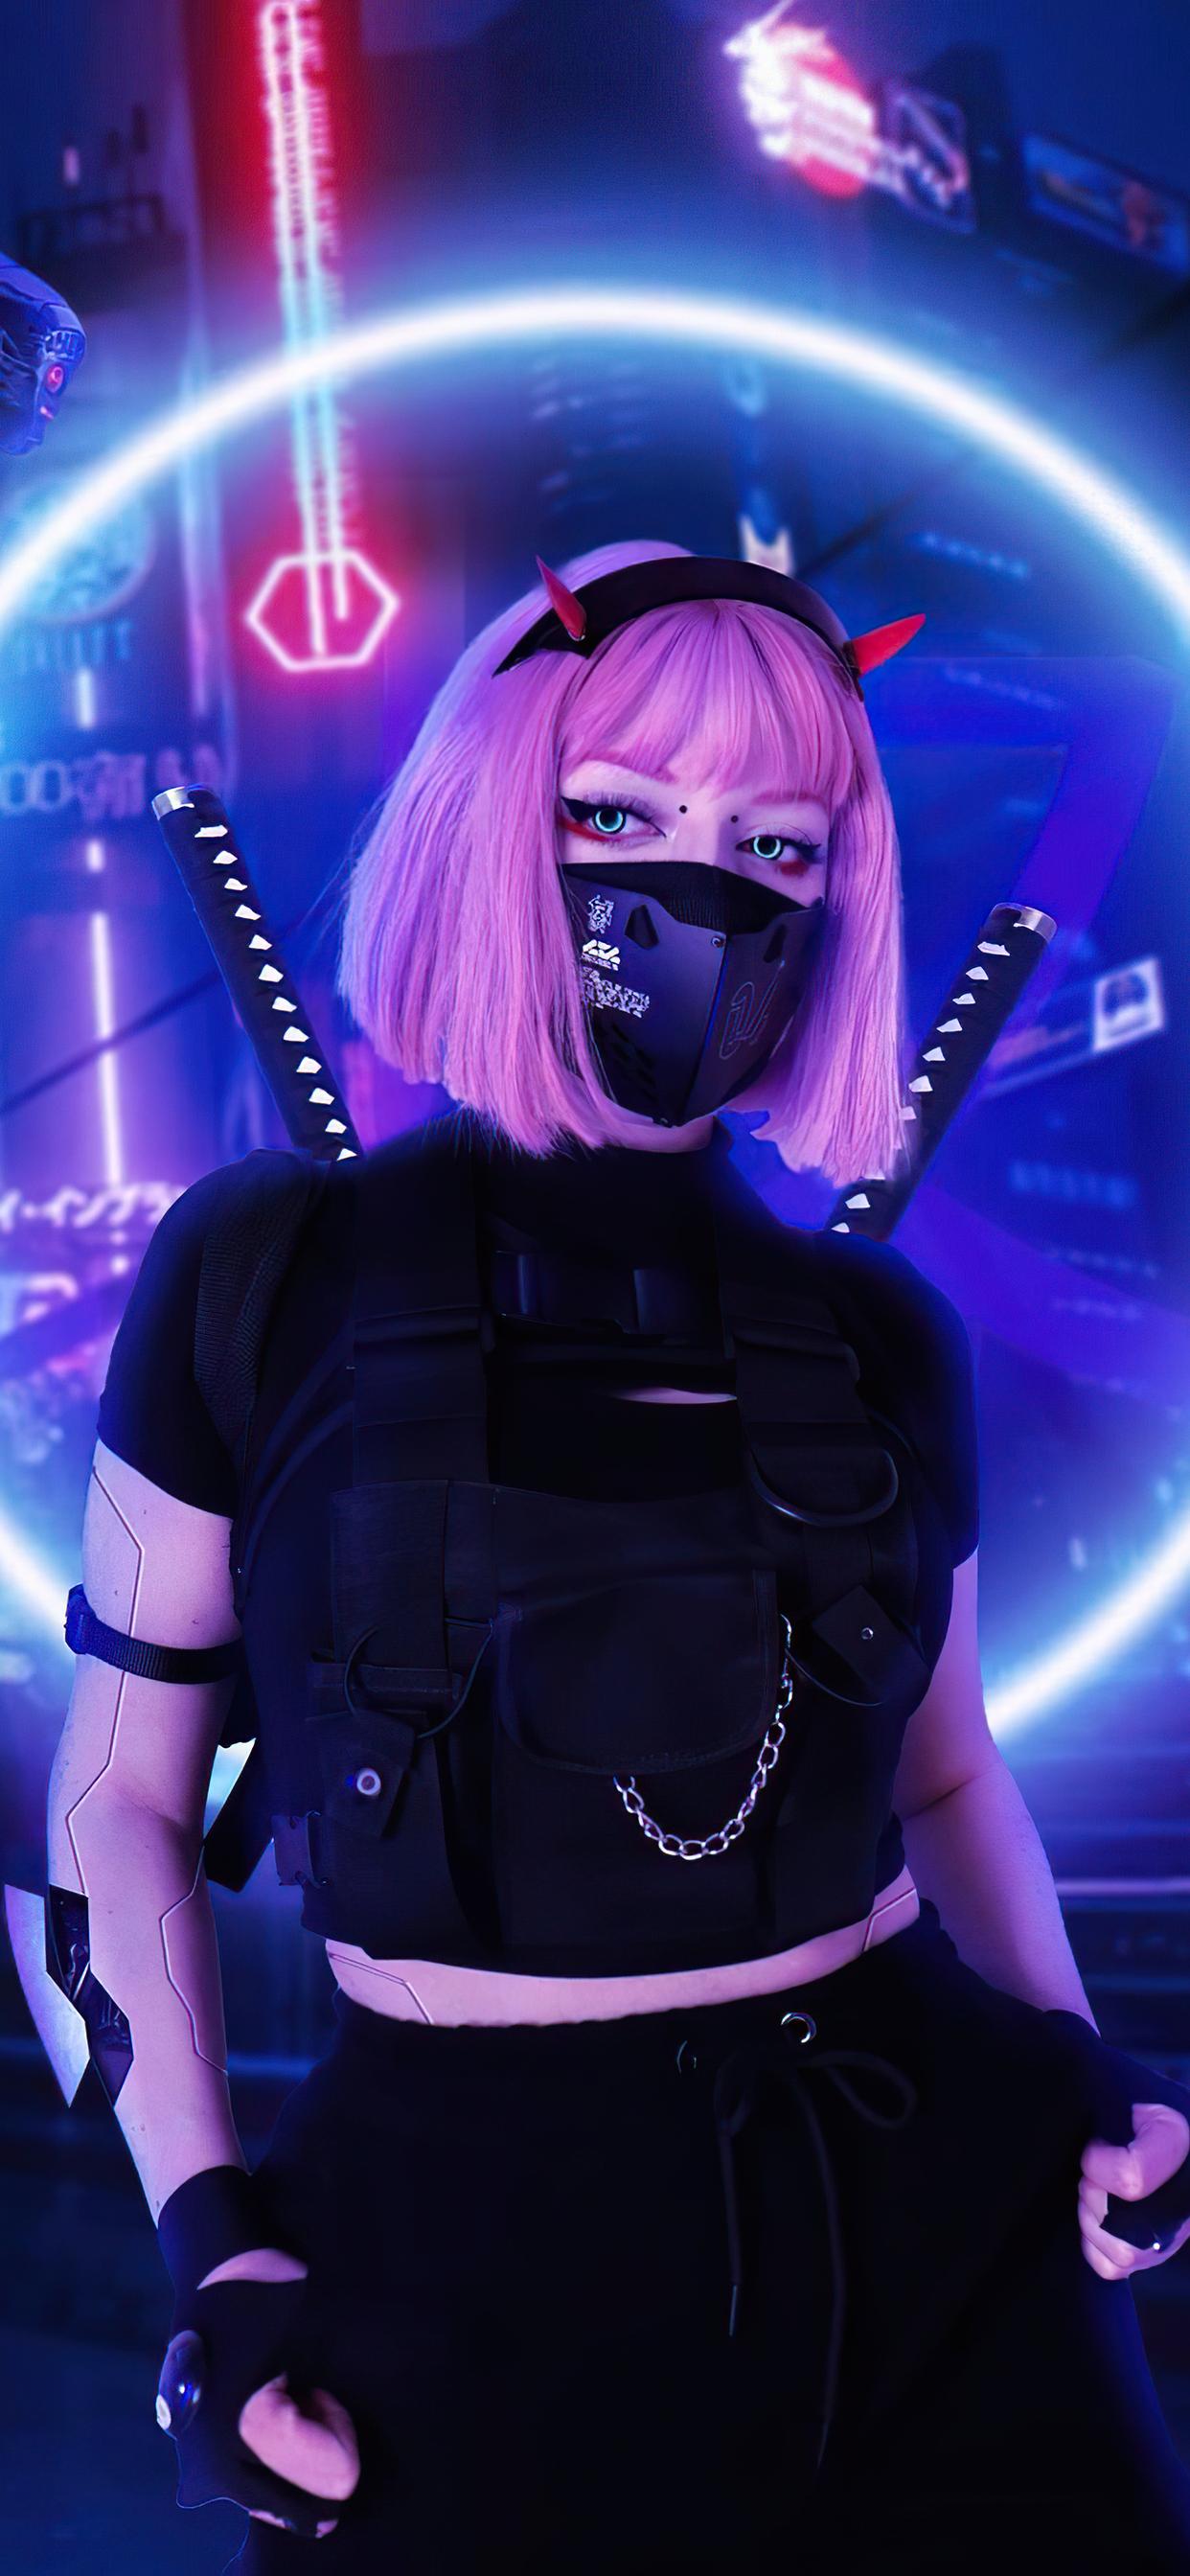 cyber-genetic-girl-4k-qj.jpg